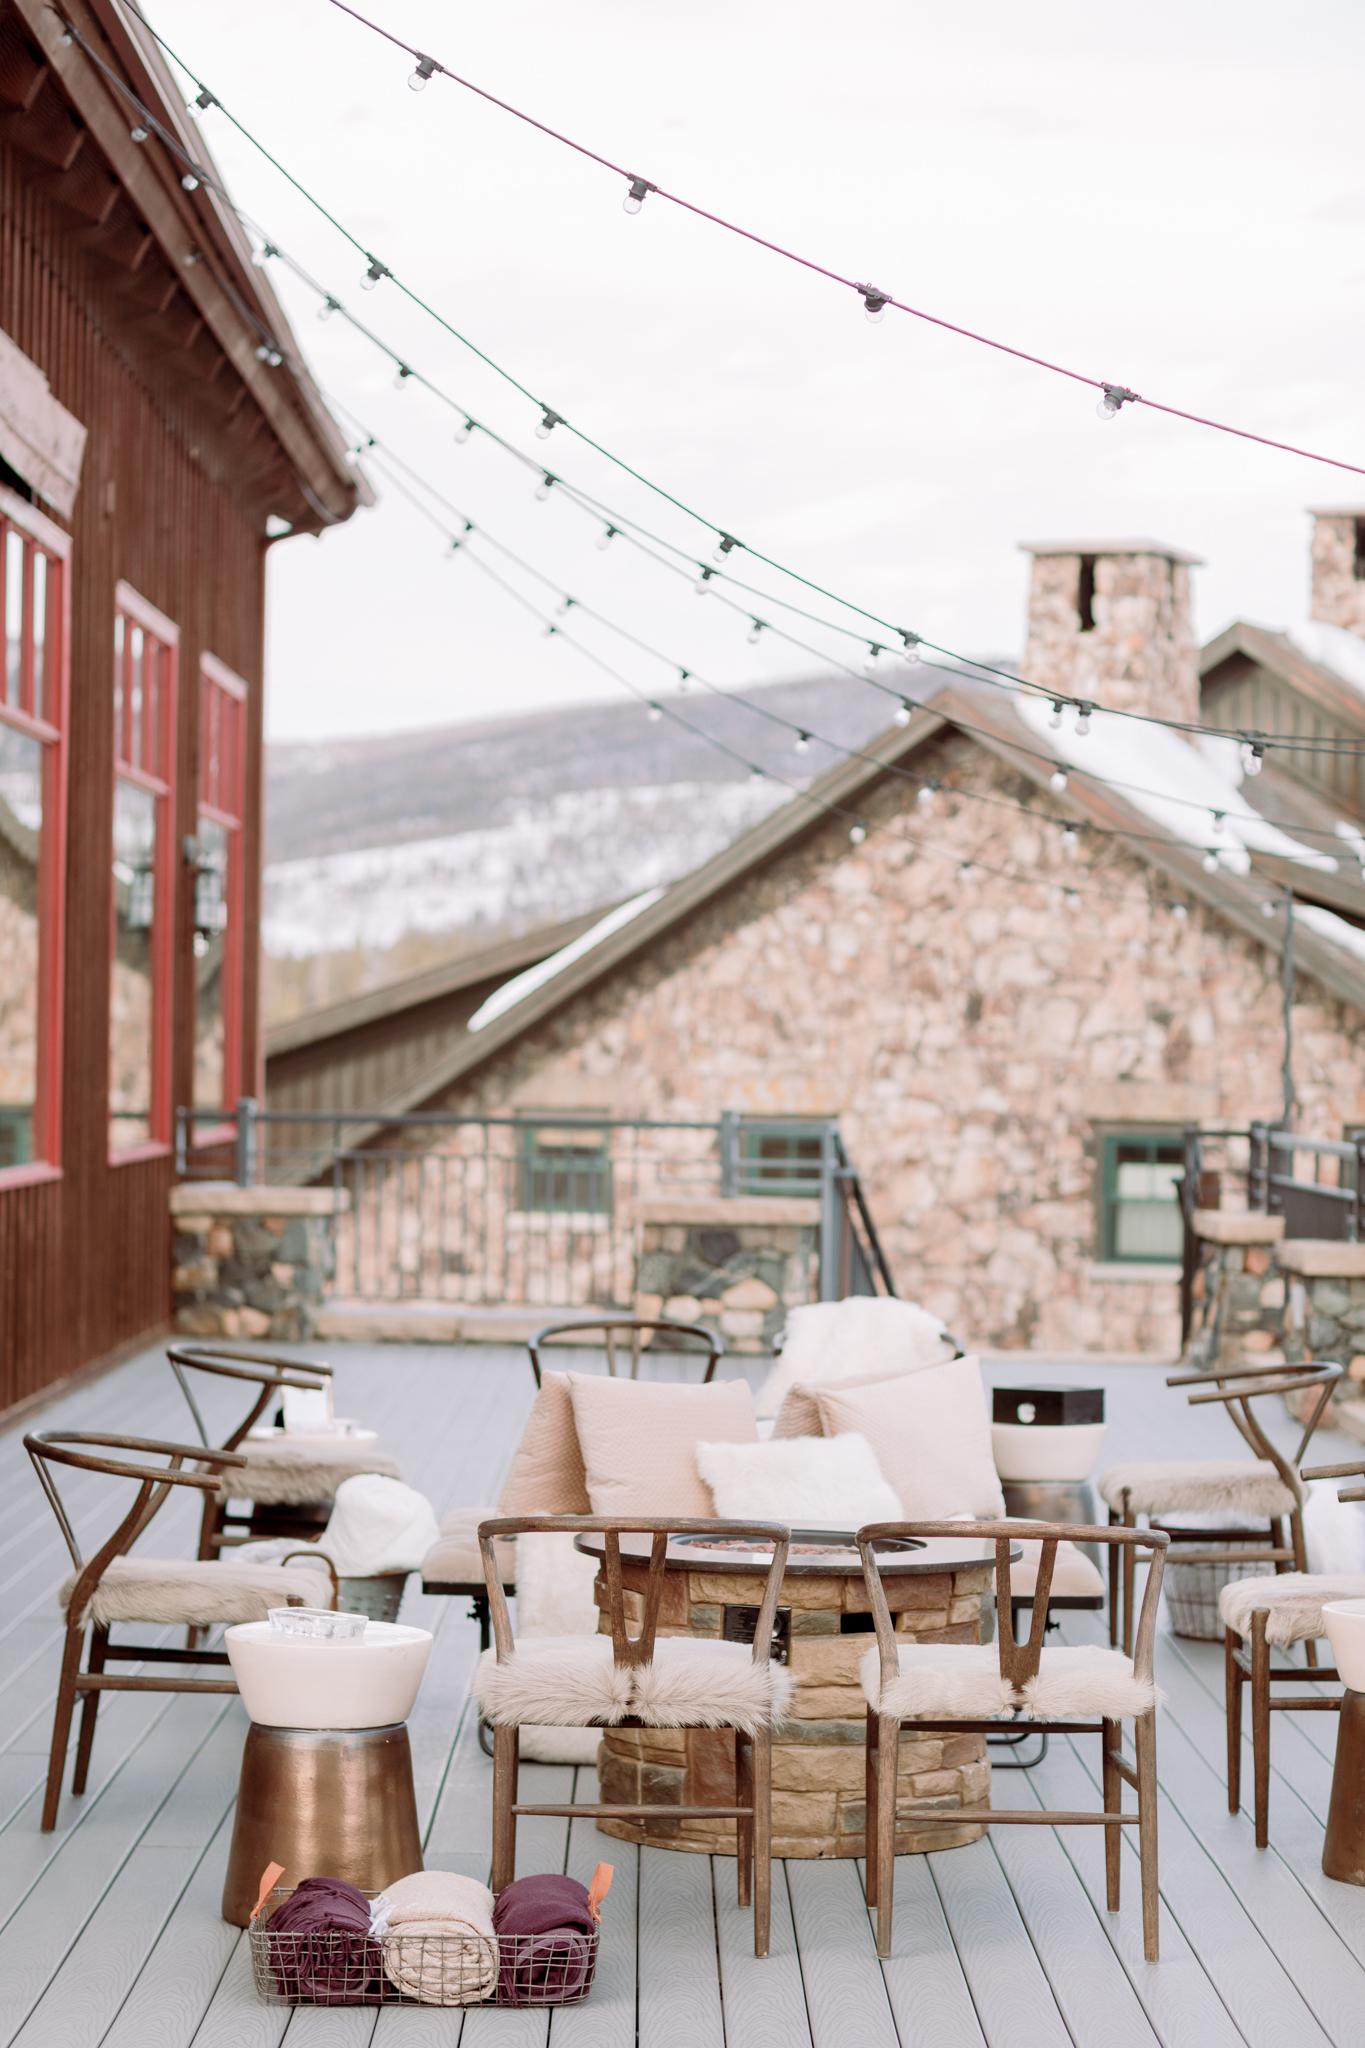 Devils-Thumb-Ranch-Tabernash-Colorado-Winter-Outdoor-Cocktail-Hour-Lounge